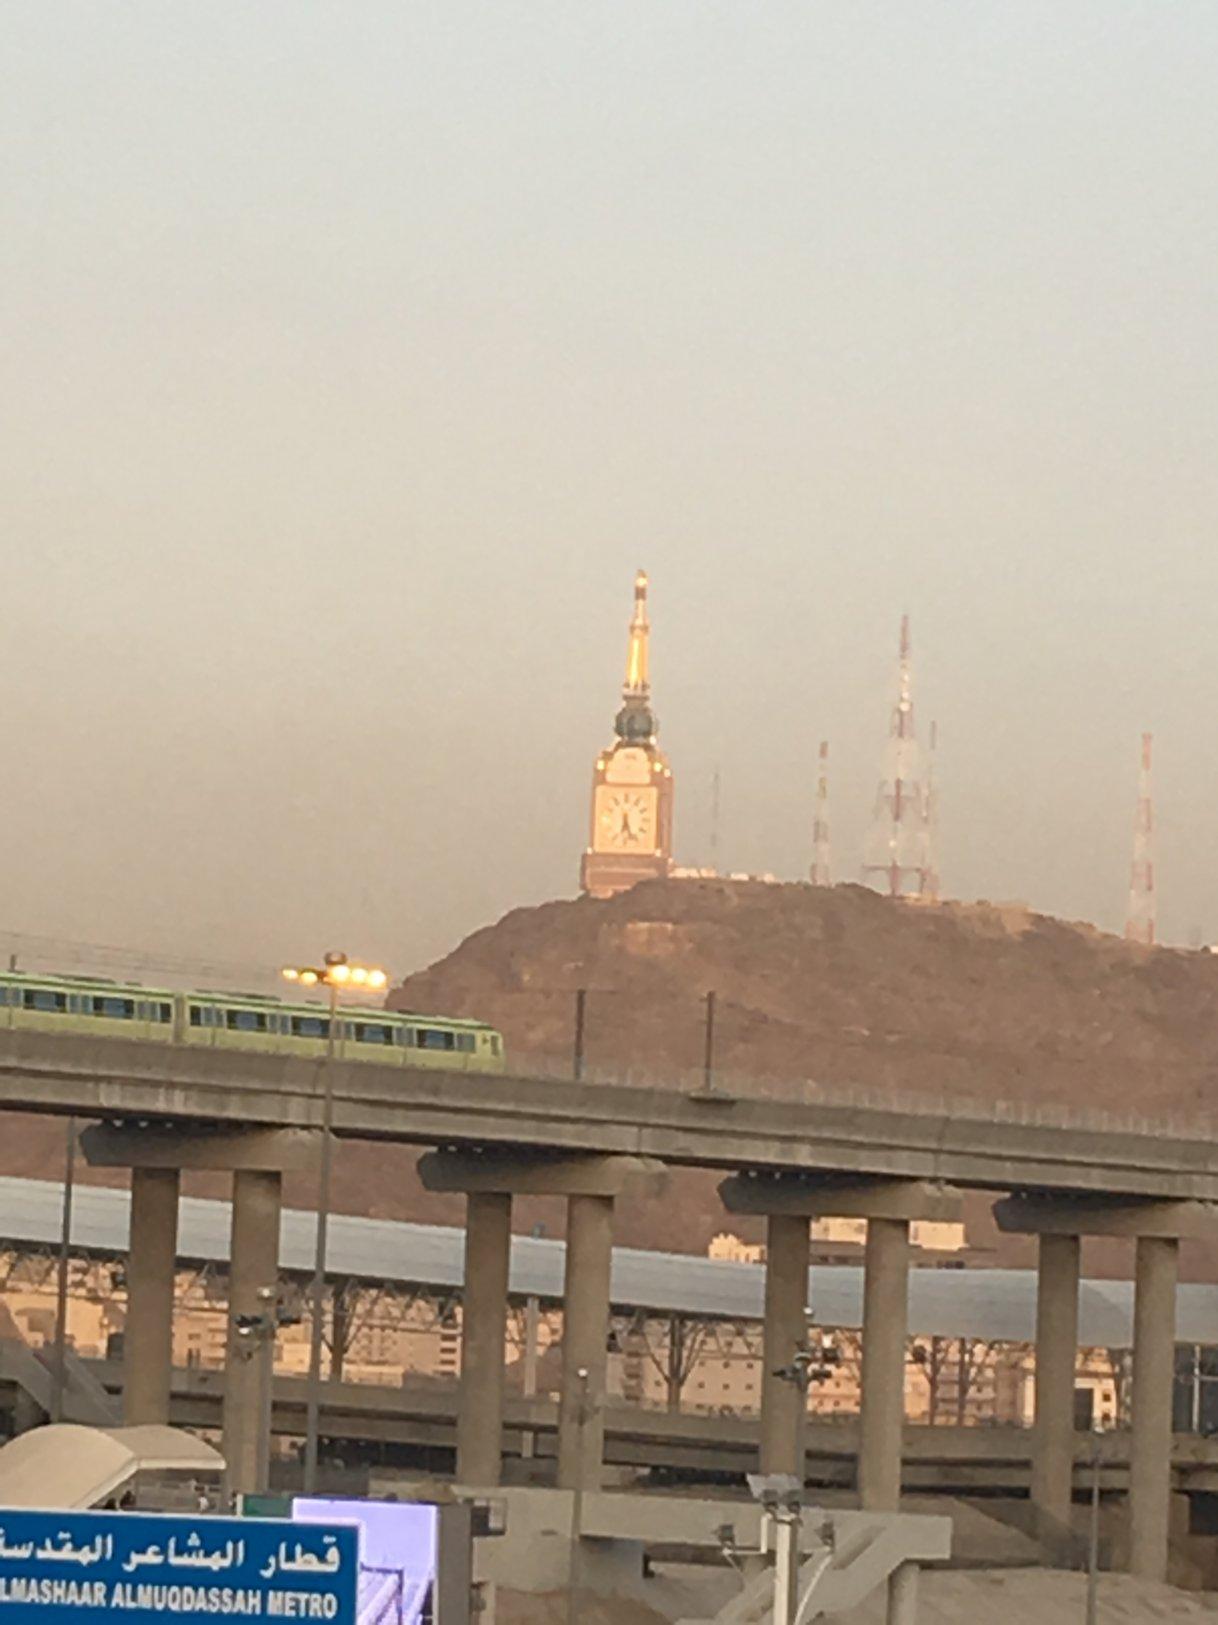 train_tower